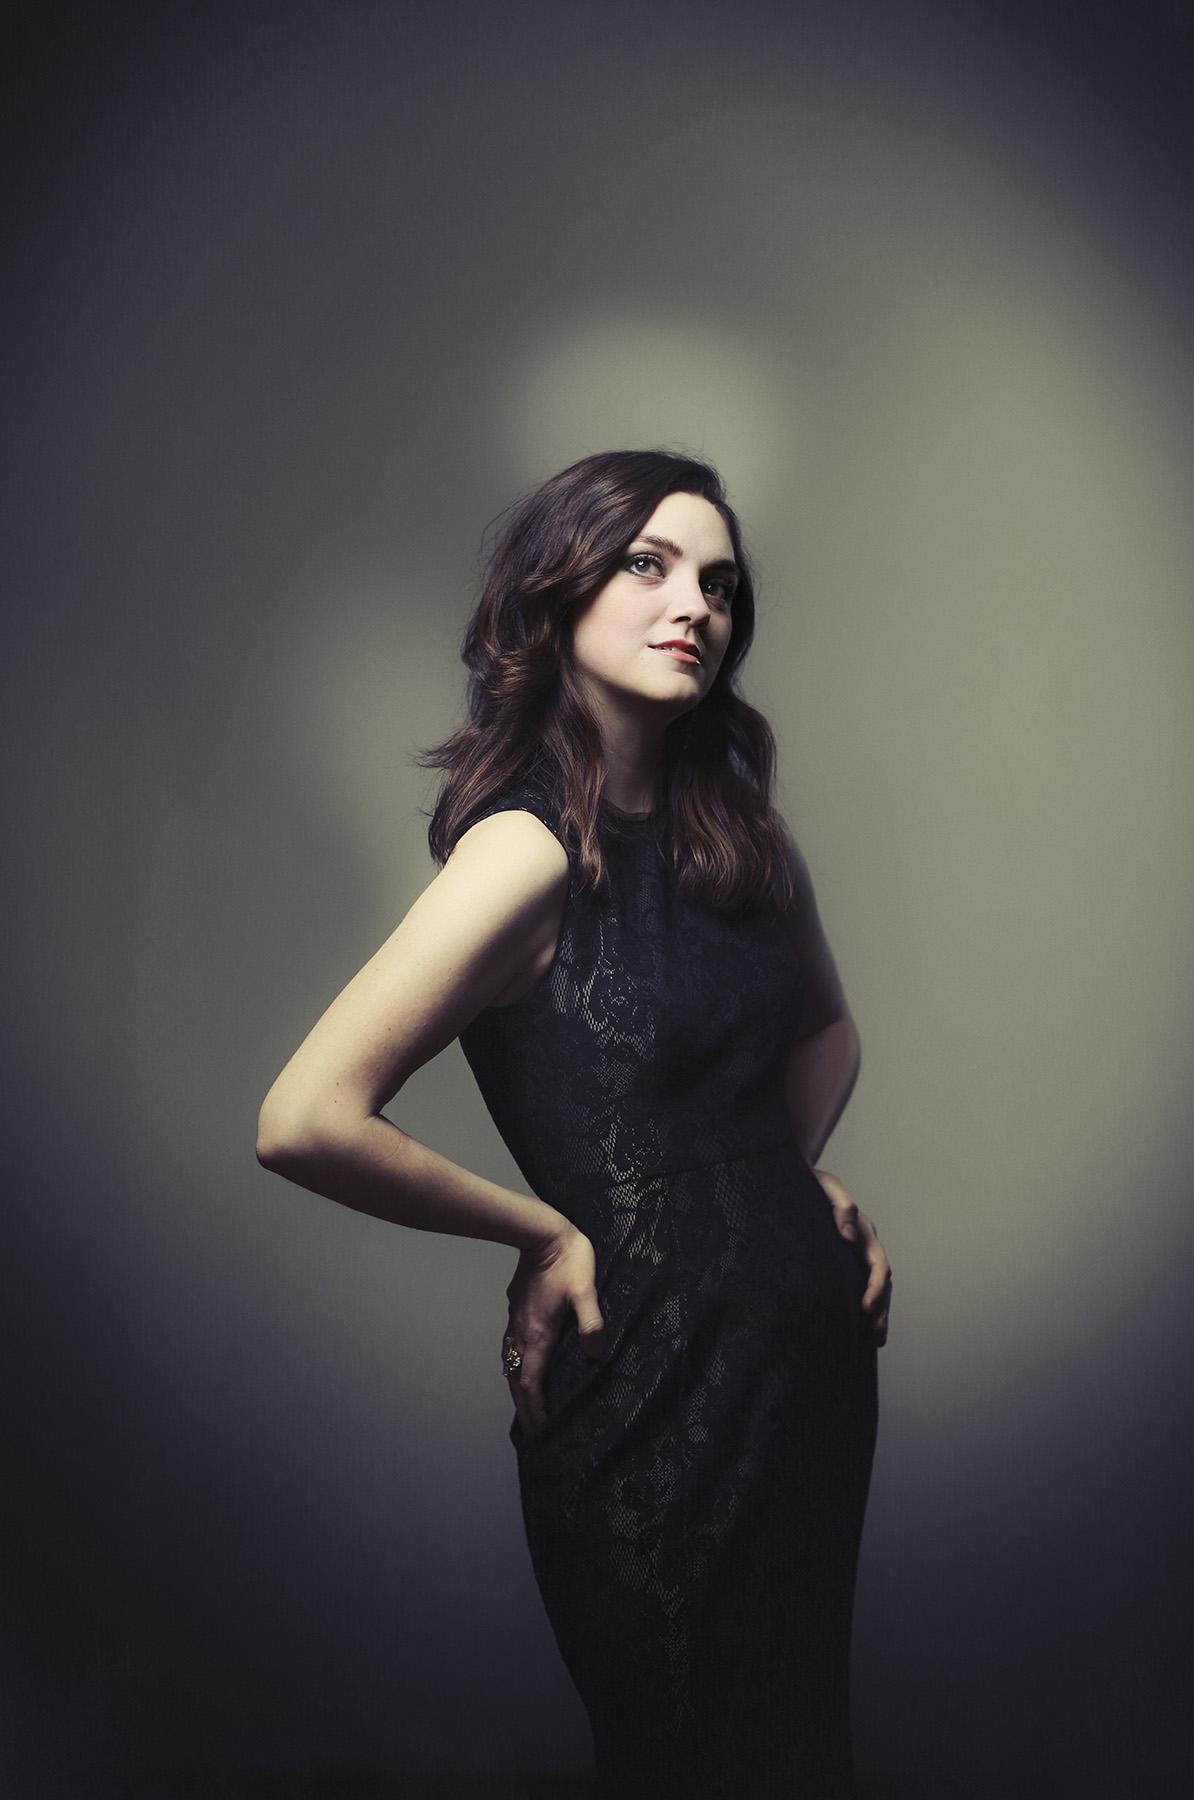 Mezzo-soprano, Samantha Gossard